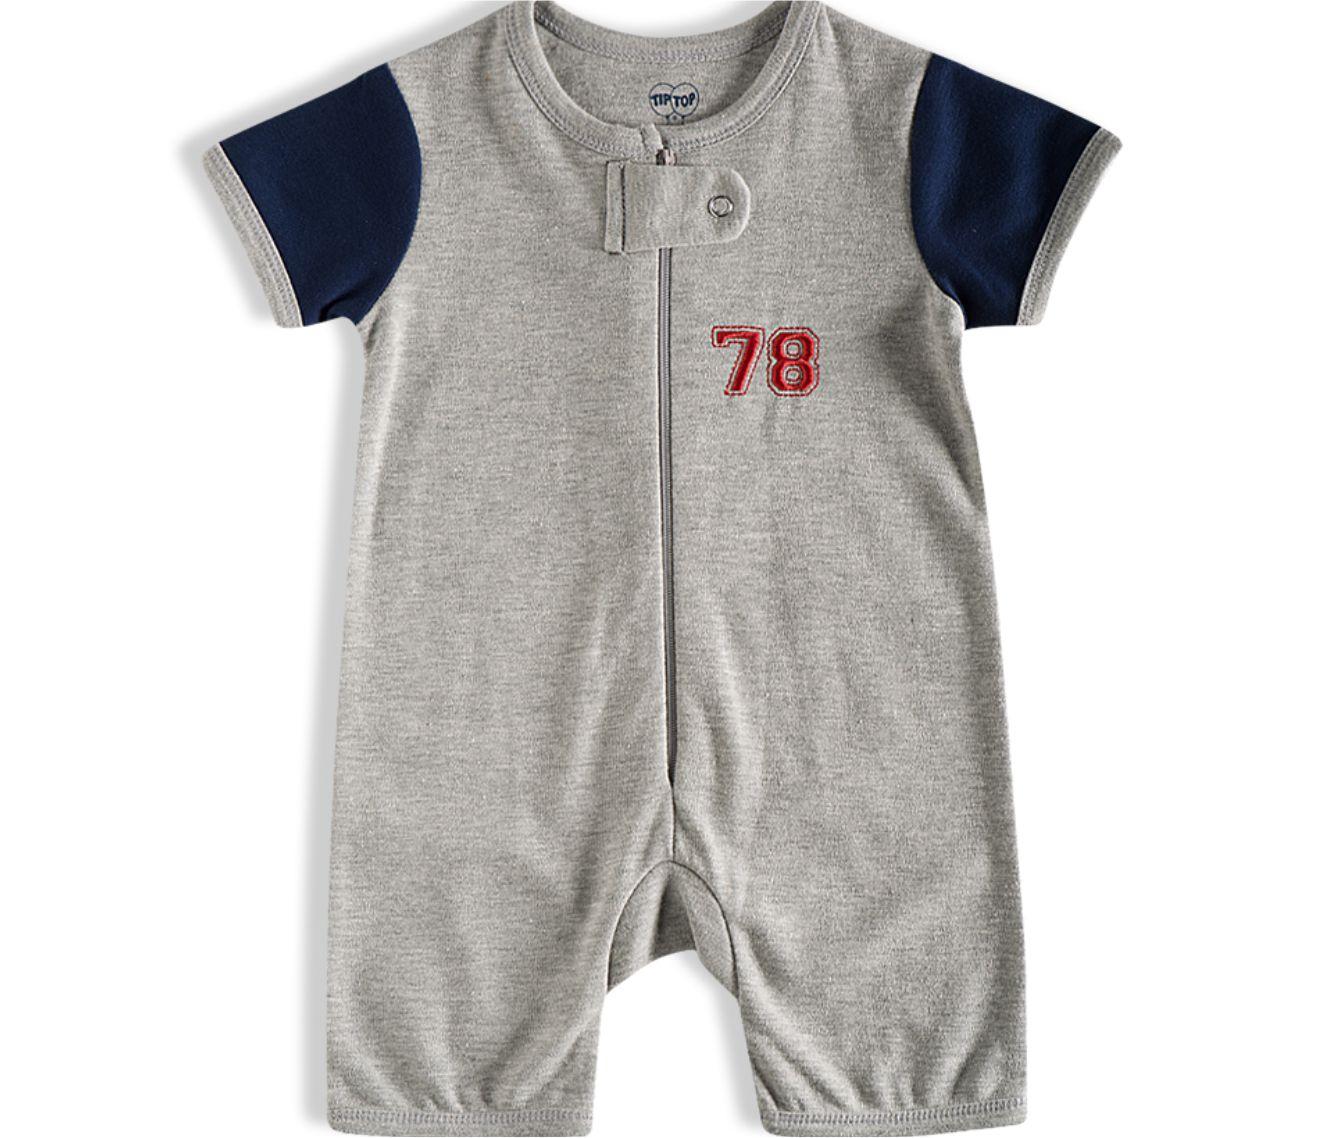 Macacão infantil masculino - Tip Top - 10209210